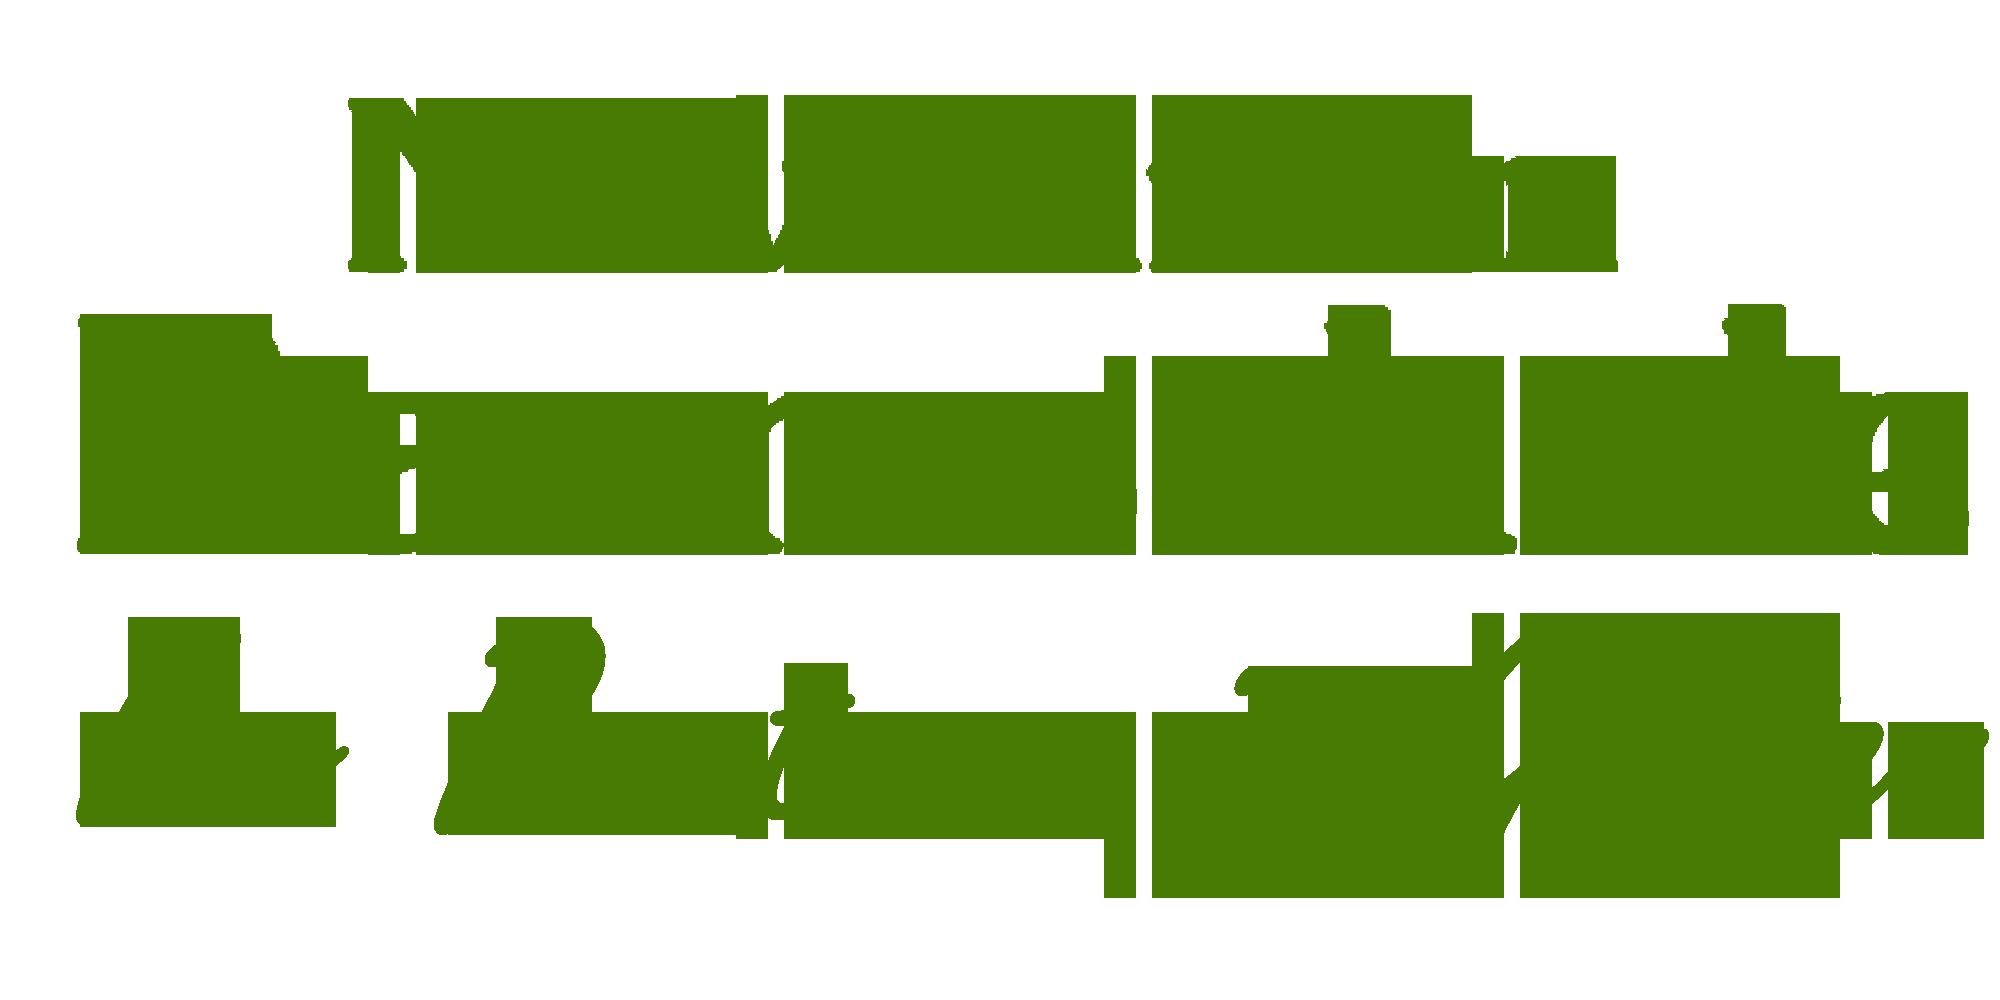 Baumschule NewGarden - Gartenpflanzen aller Art